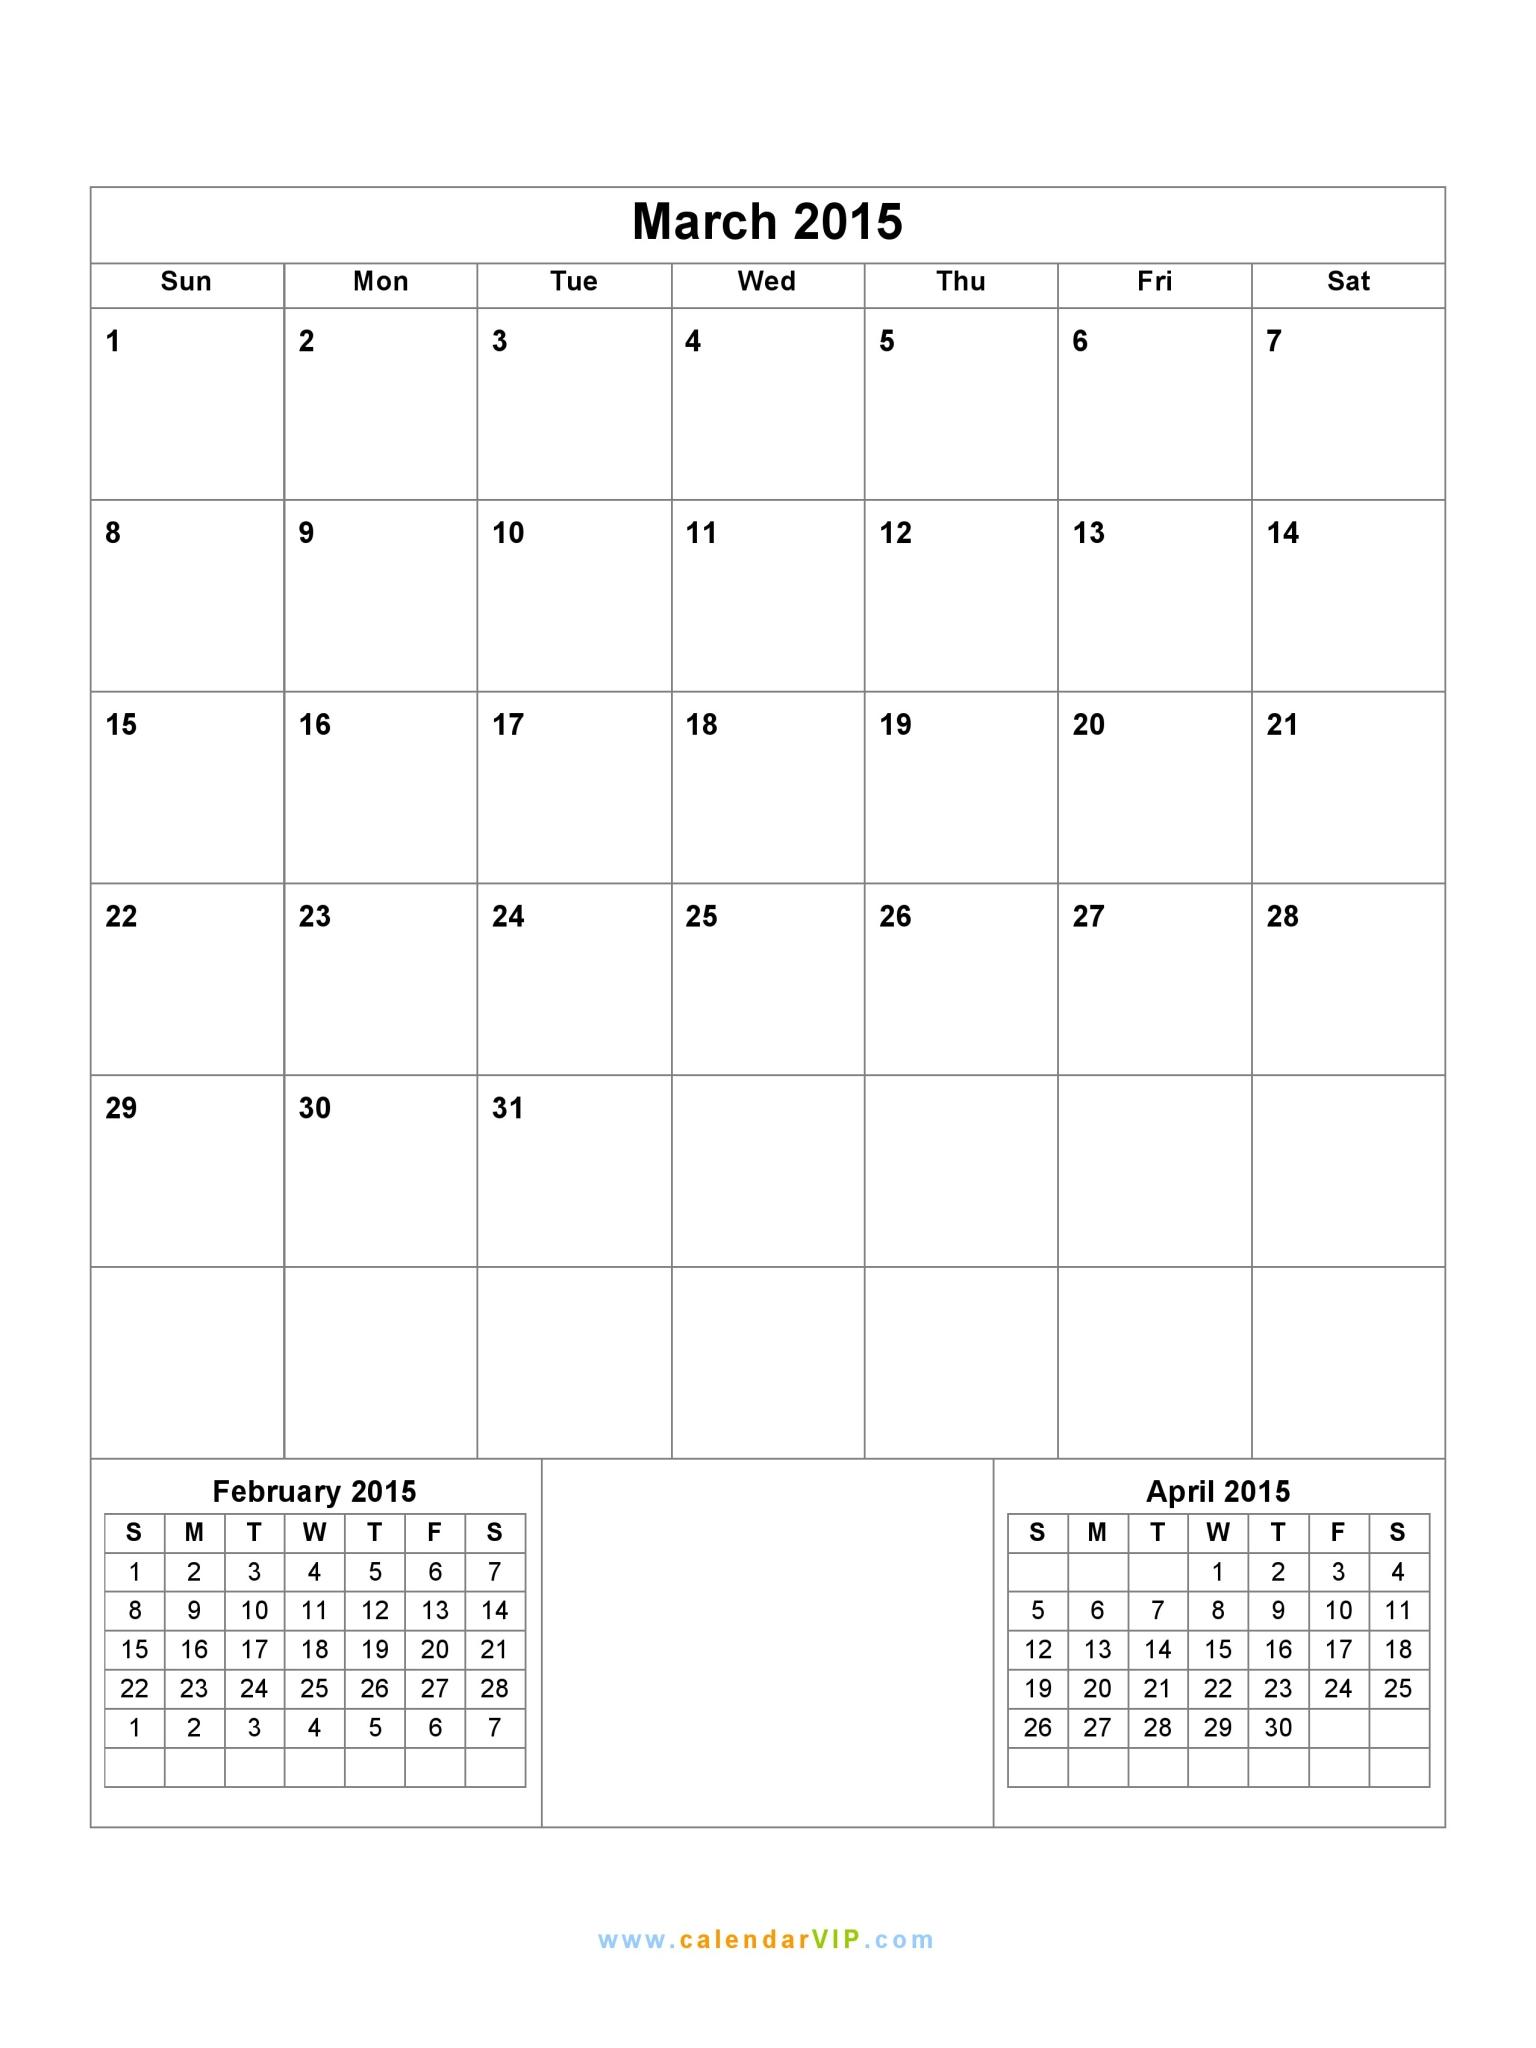 March 2015 calendar blank printable calendar template in pdf word march 2015 calendar saigontimesfo